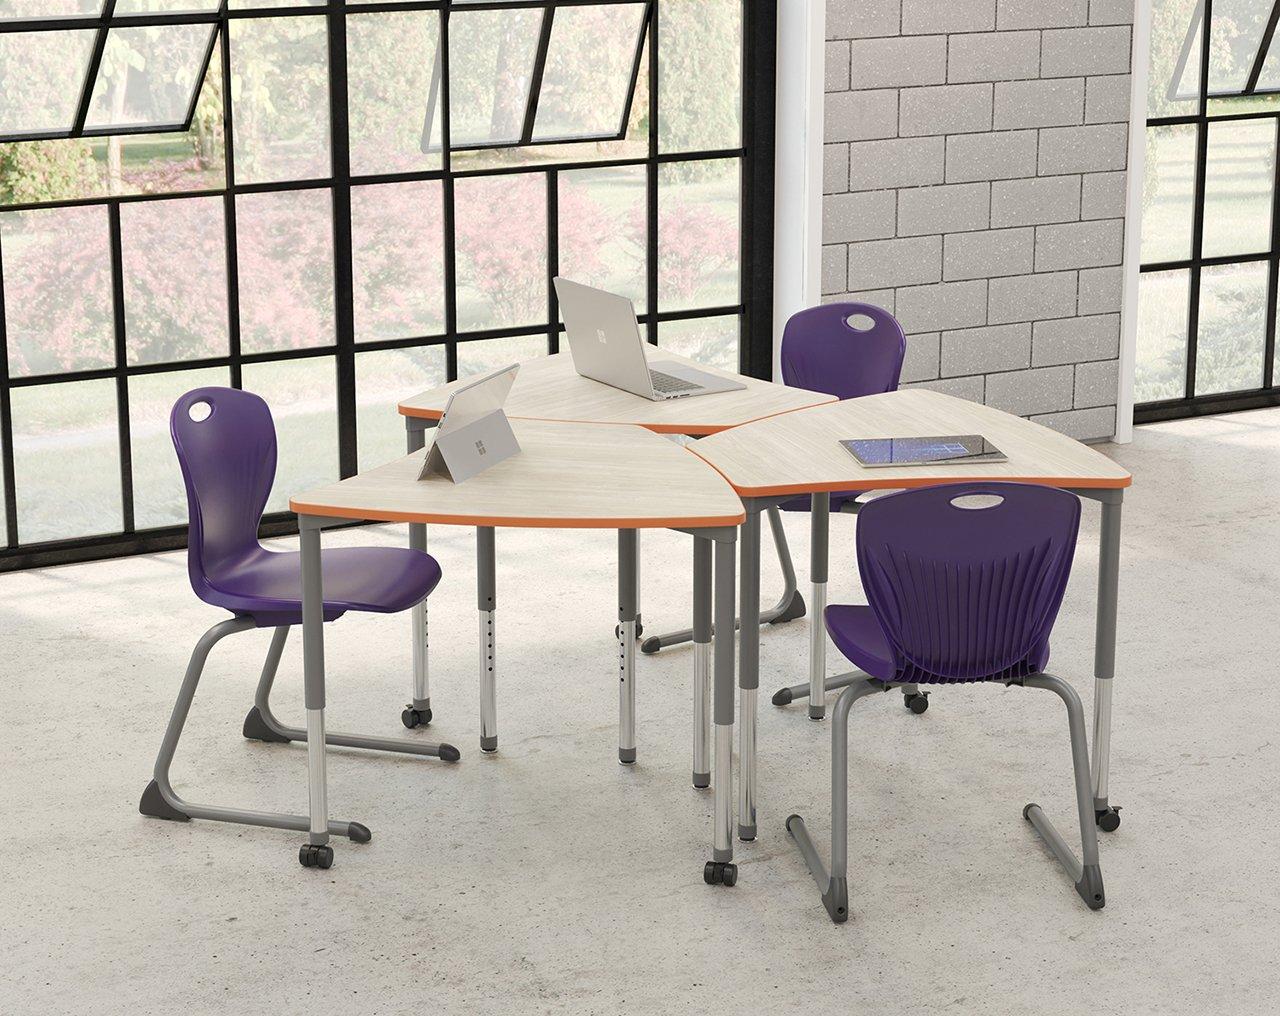 artcobell_classroom14_versatile